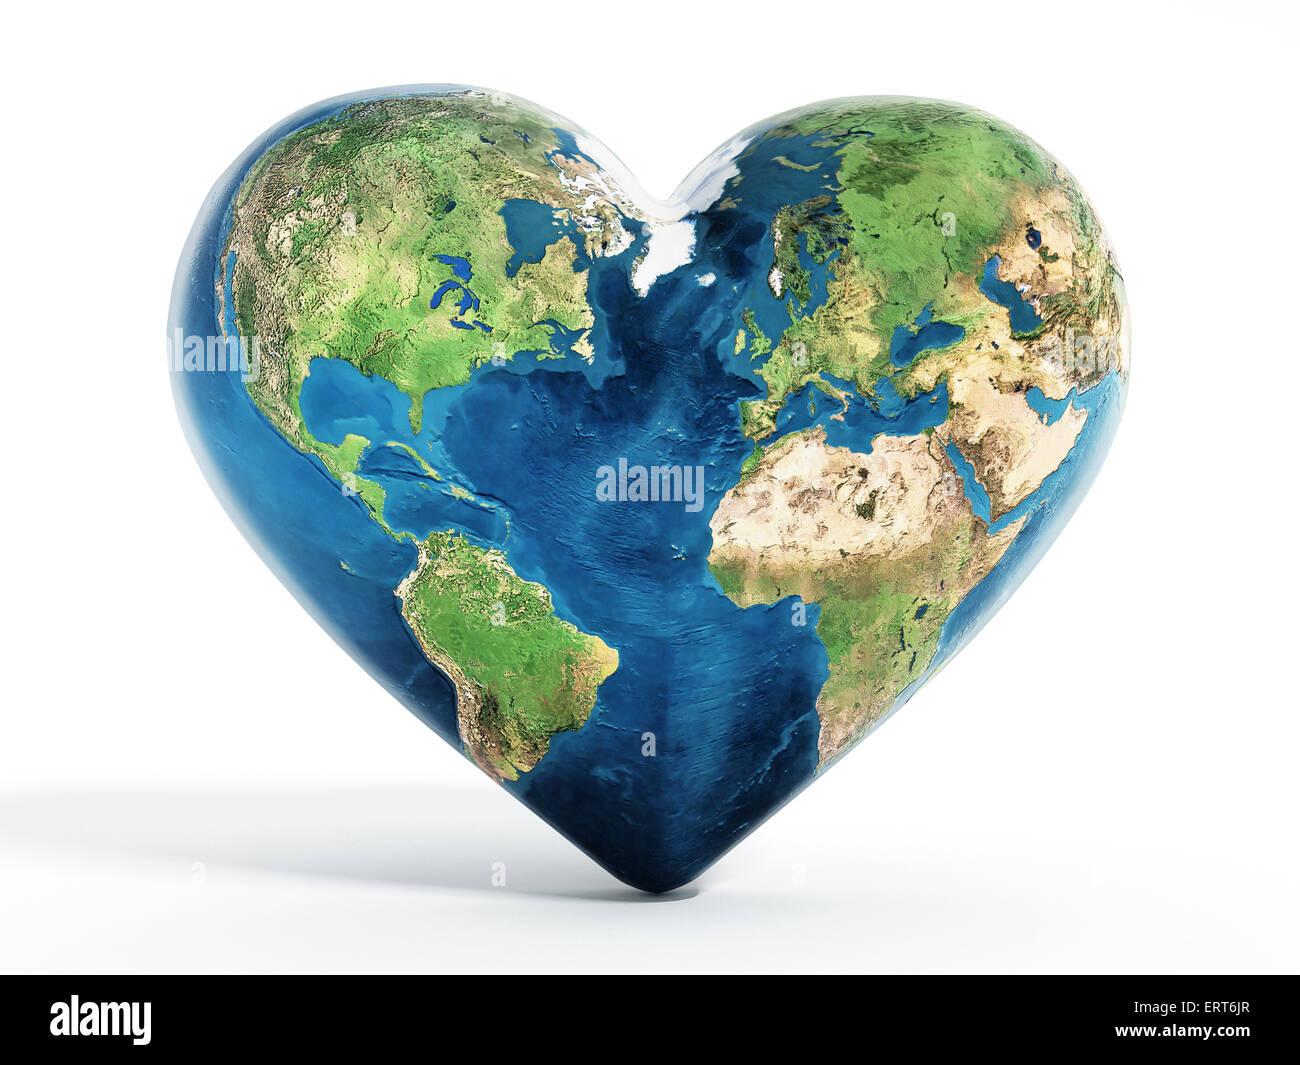 Heart shaped world map stock photos heart shaped world map stock heart shaped earth stock image gumiabroncs Gallery